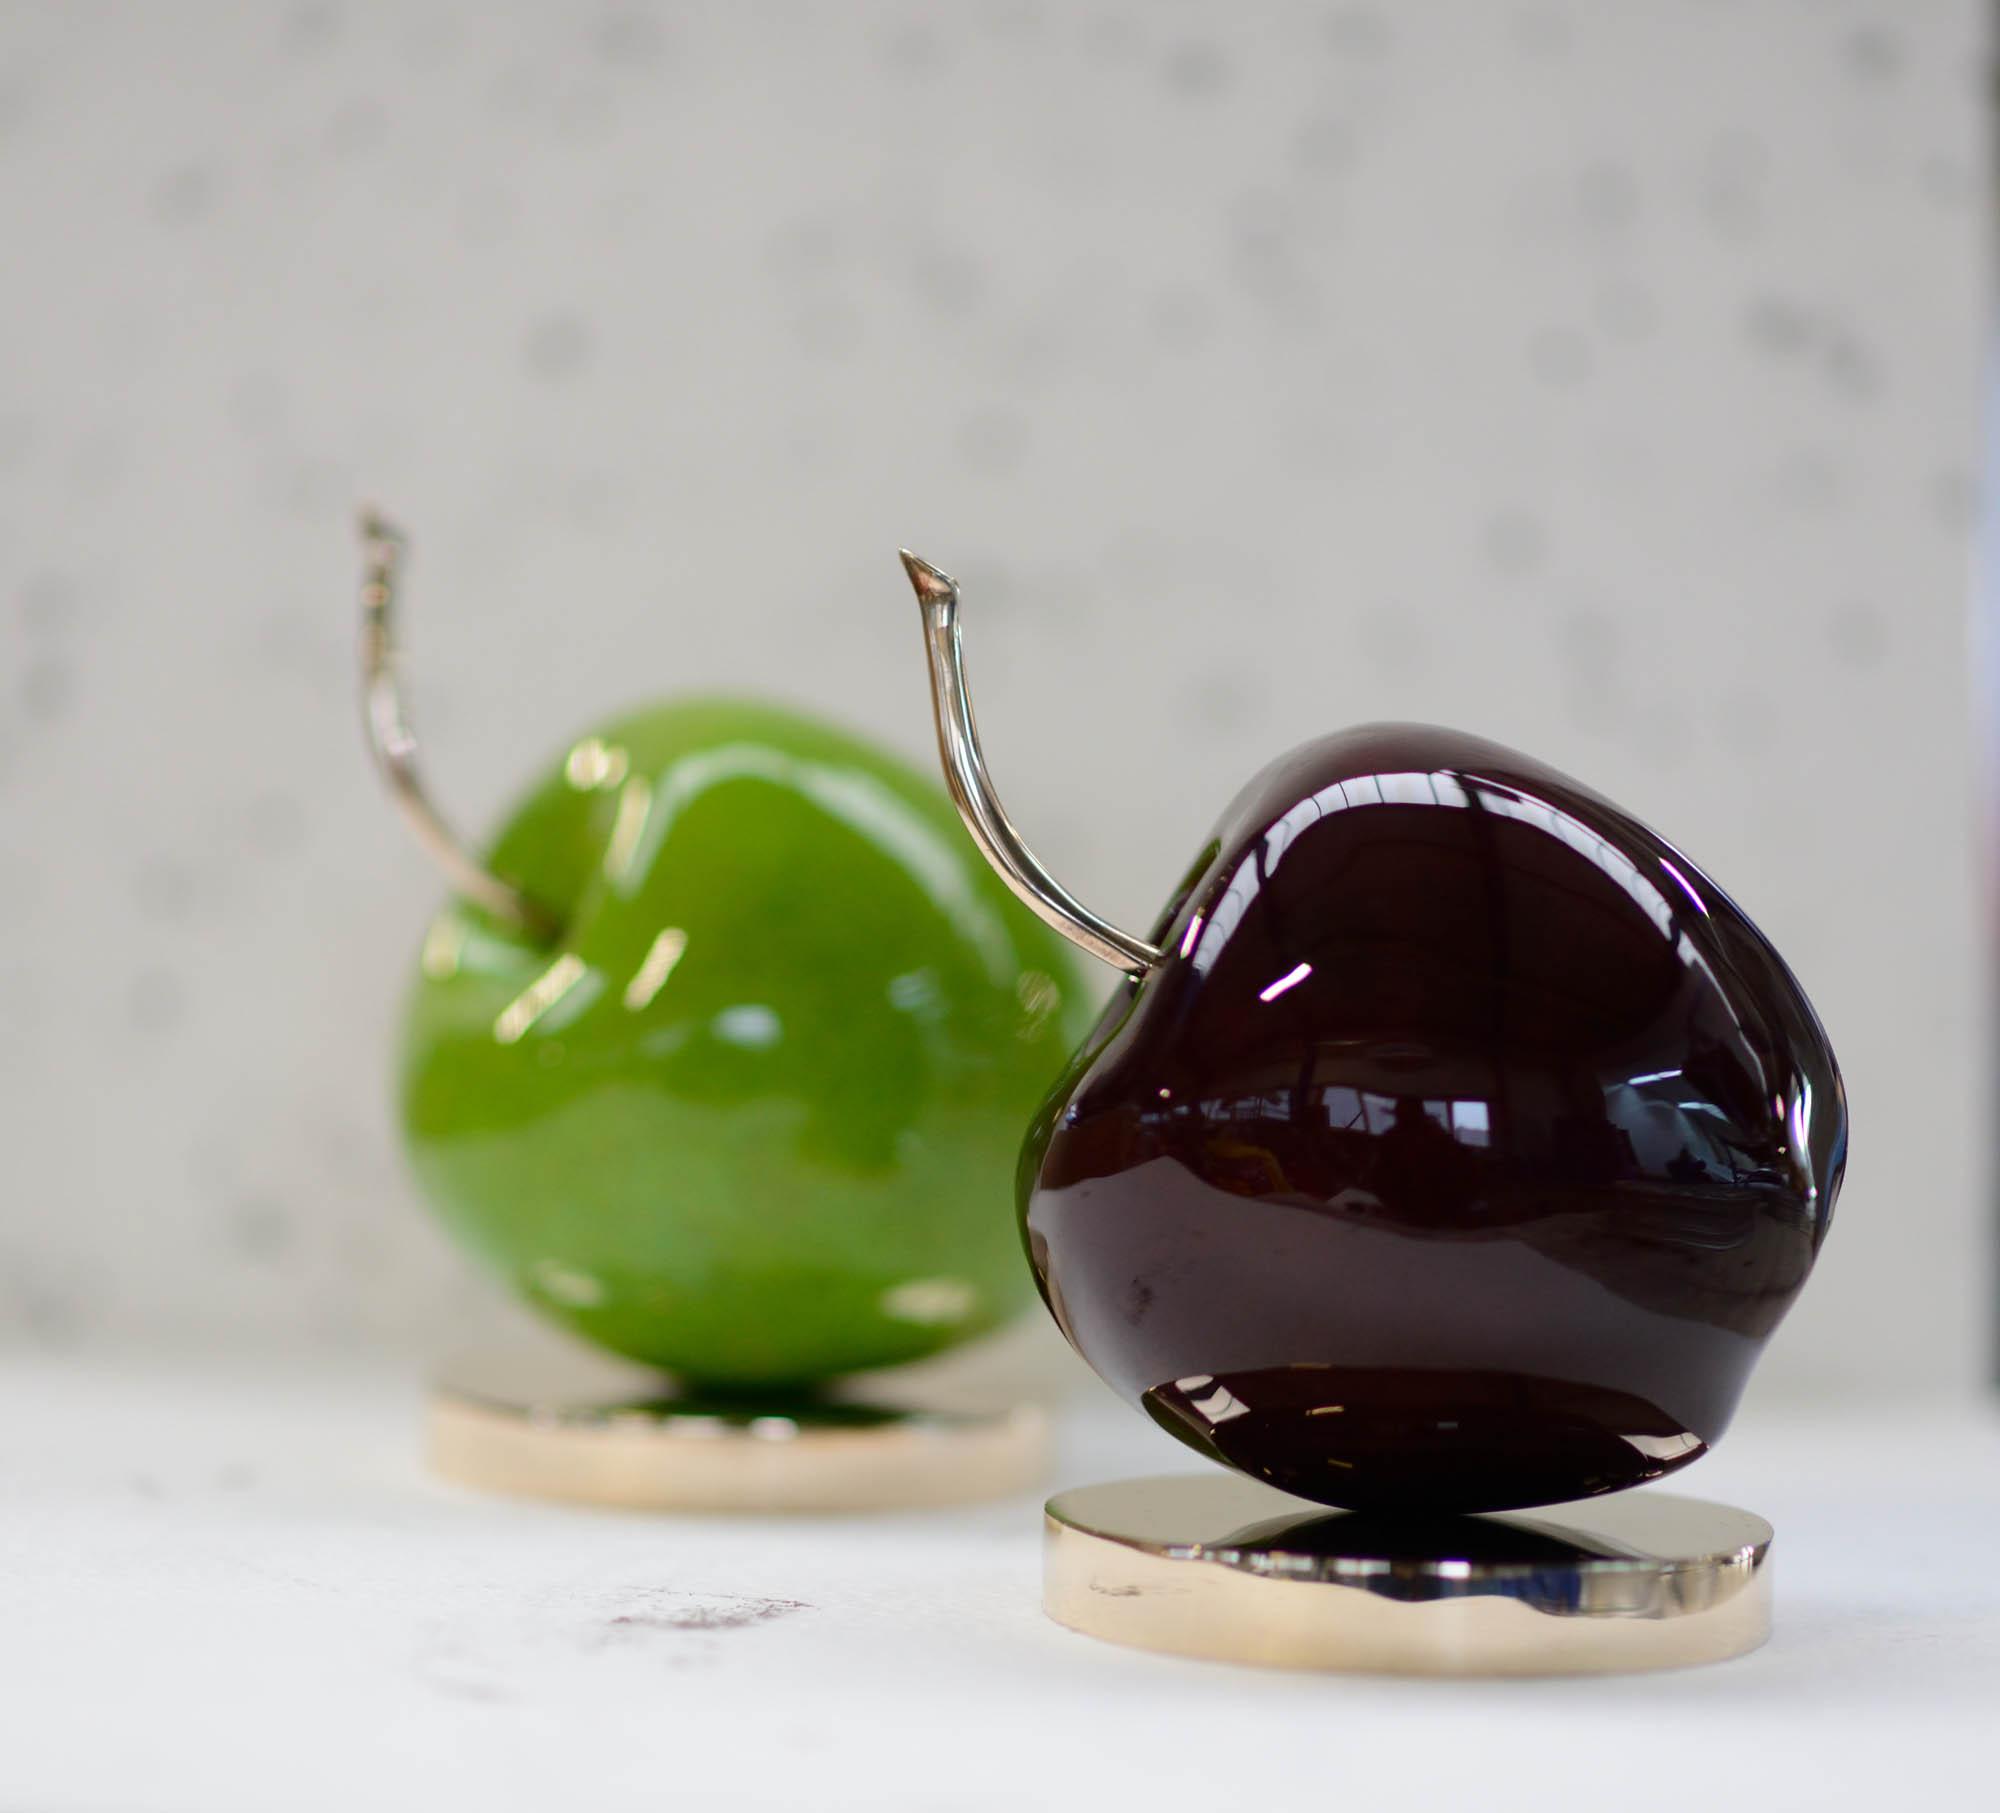 fruit-apple-03-apple-granny-dark-red